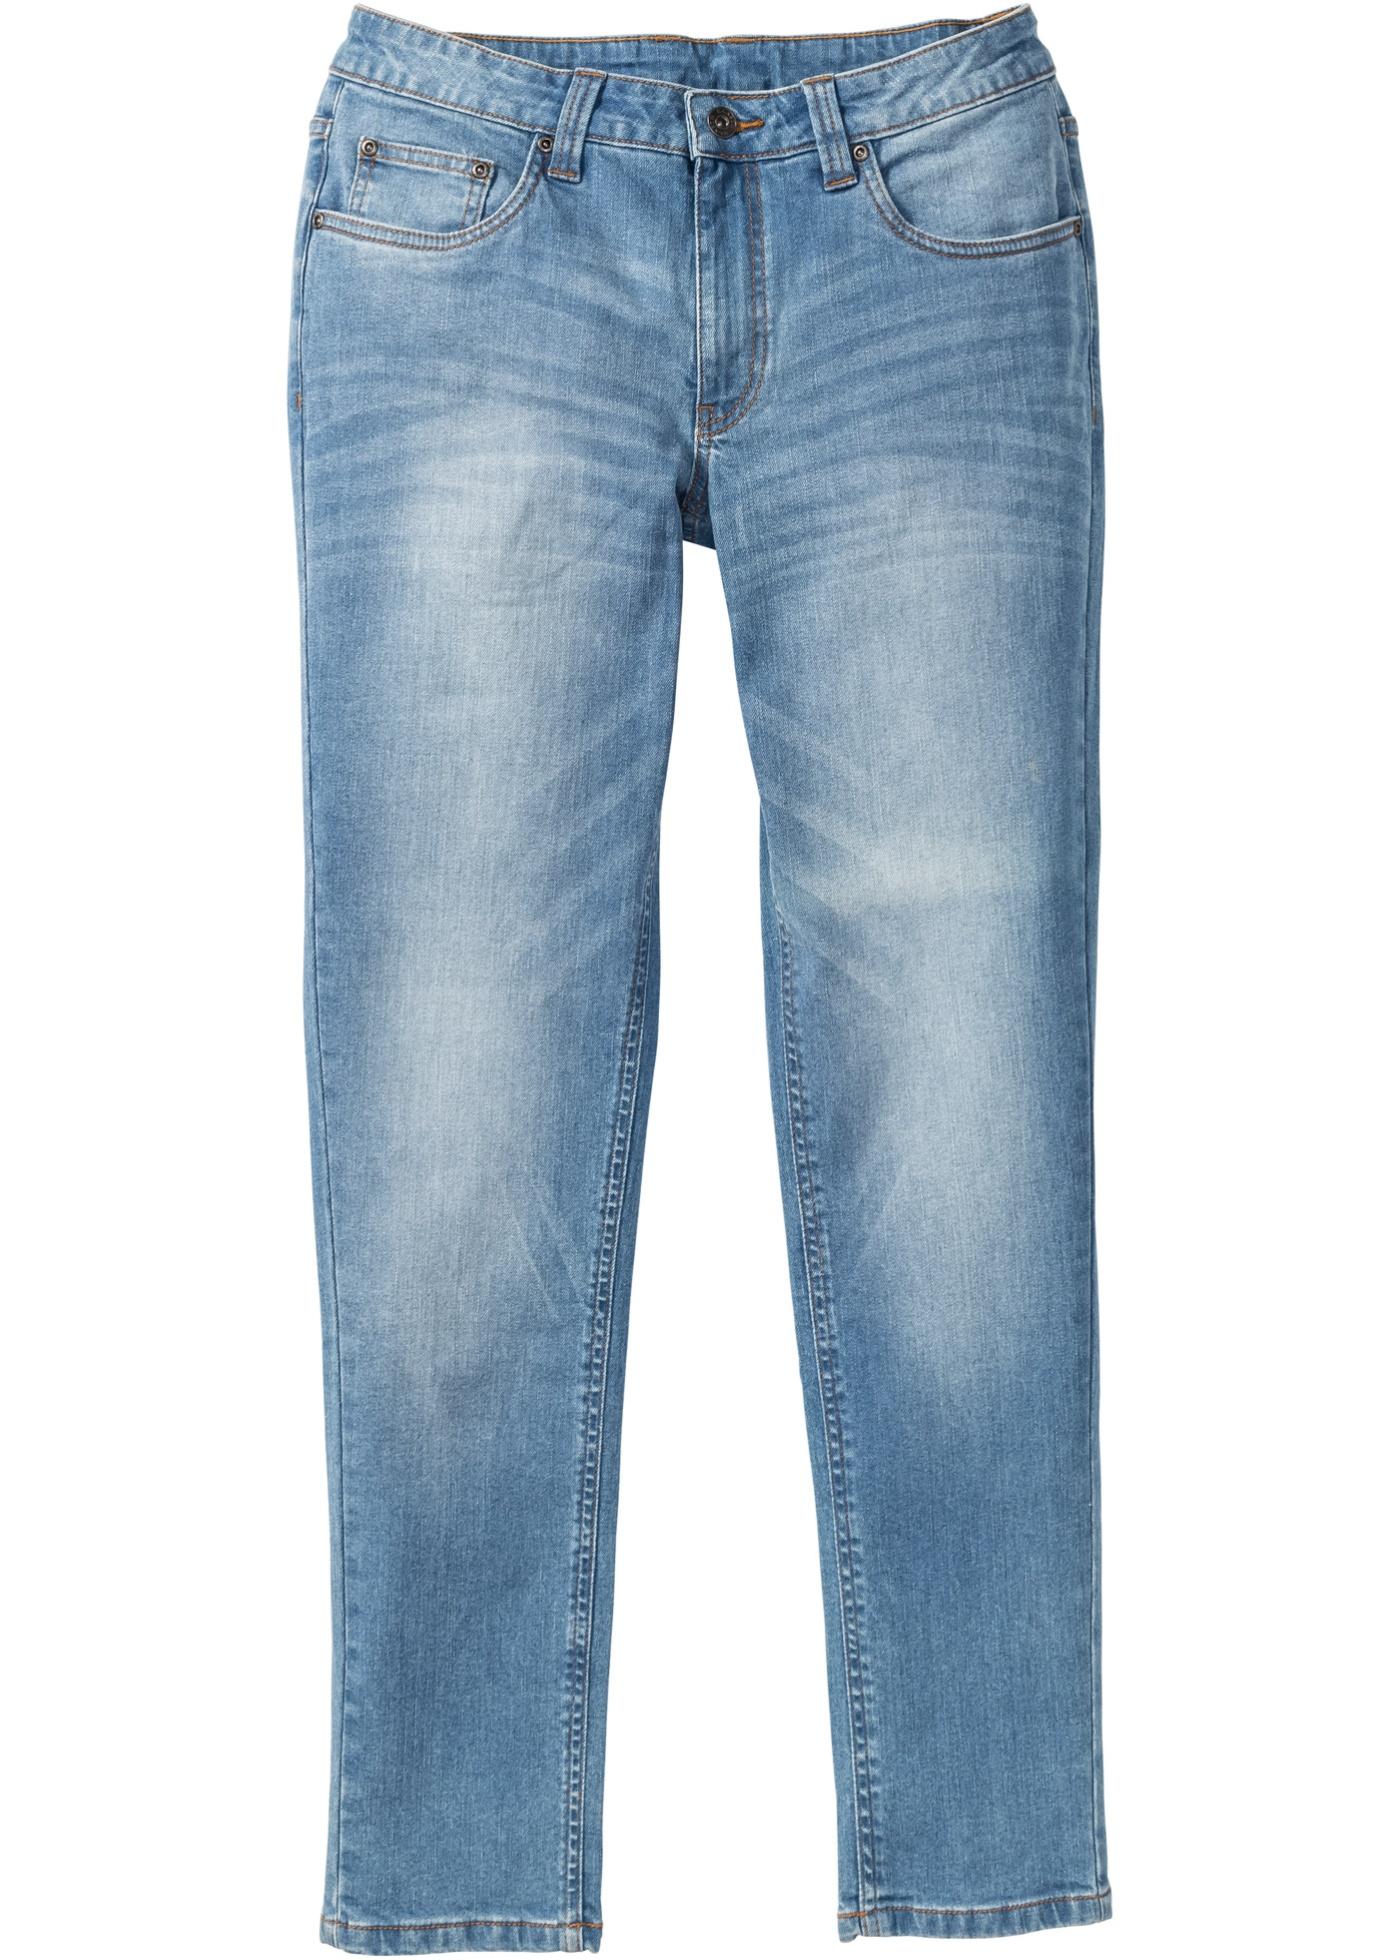 Jean extensible Skinny Fit Straight, Longueur (pouces) 32